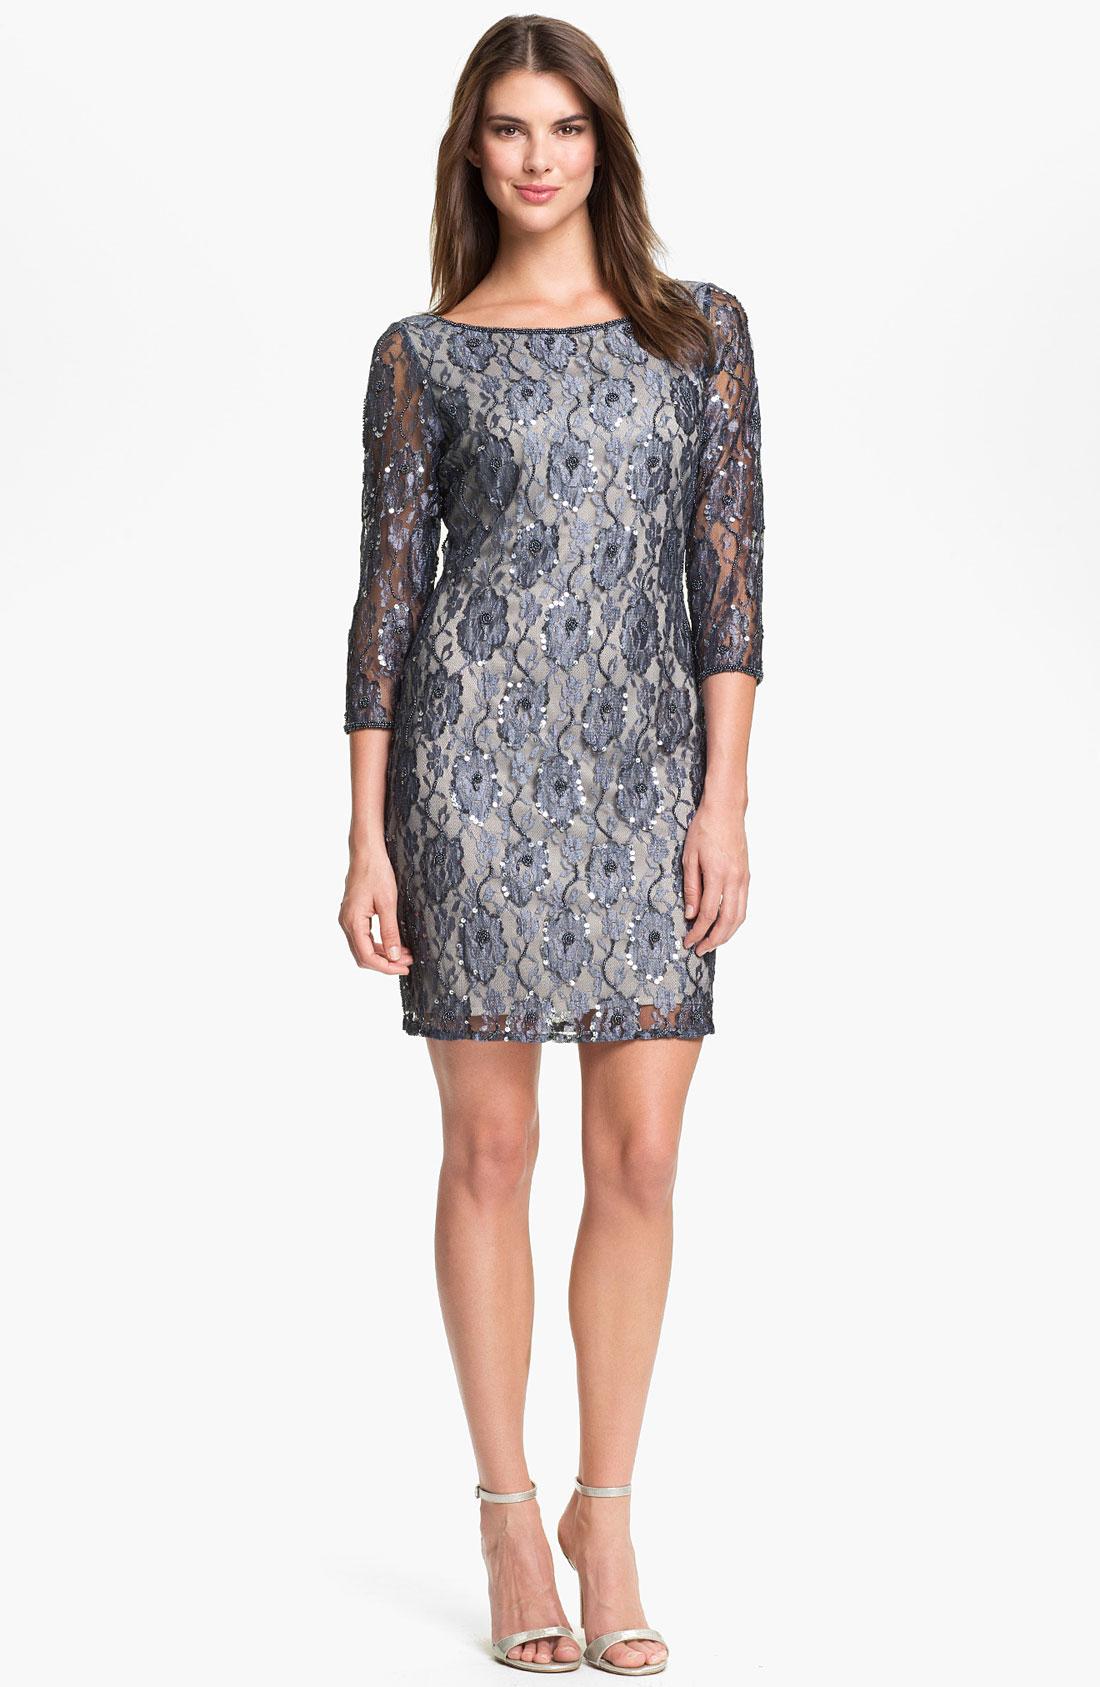 Galerry sheath embellished dress